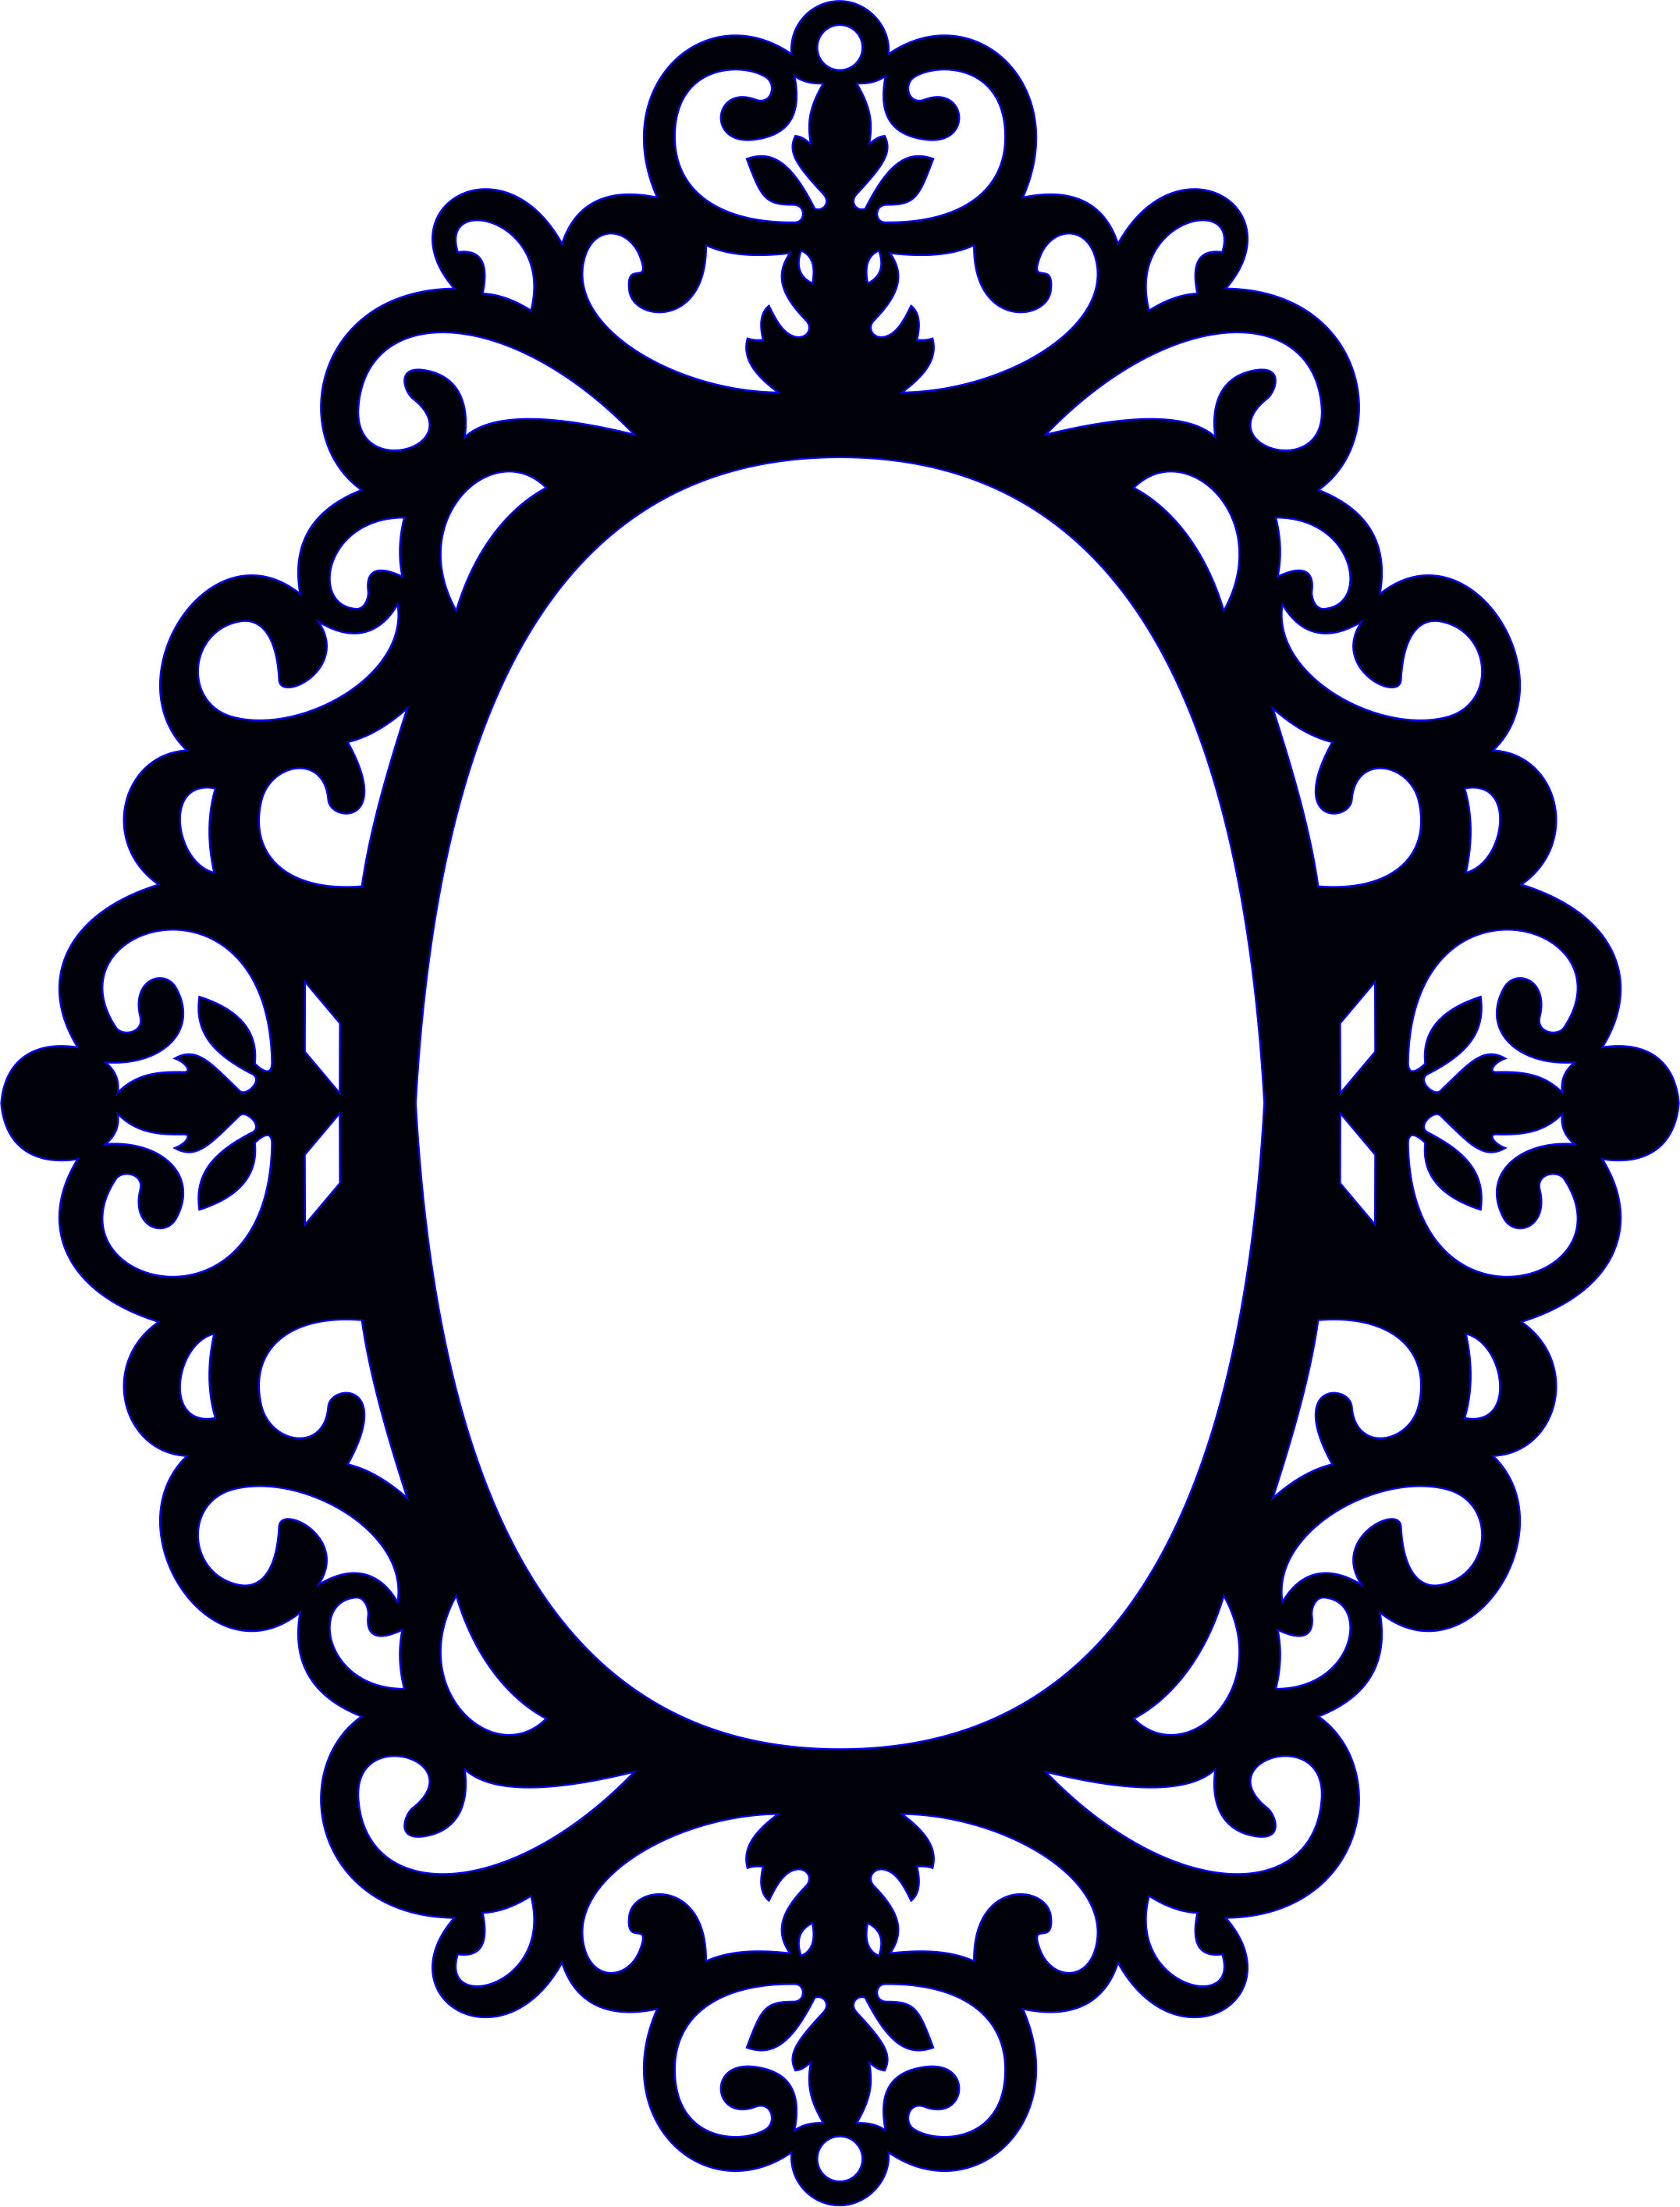 Pin de pavel en pinterest marcos for Disenos de marcos para espejos